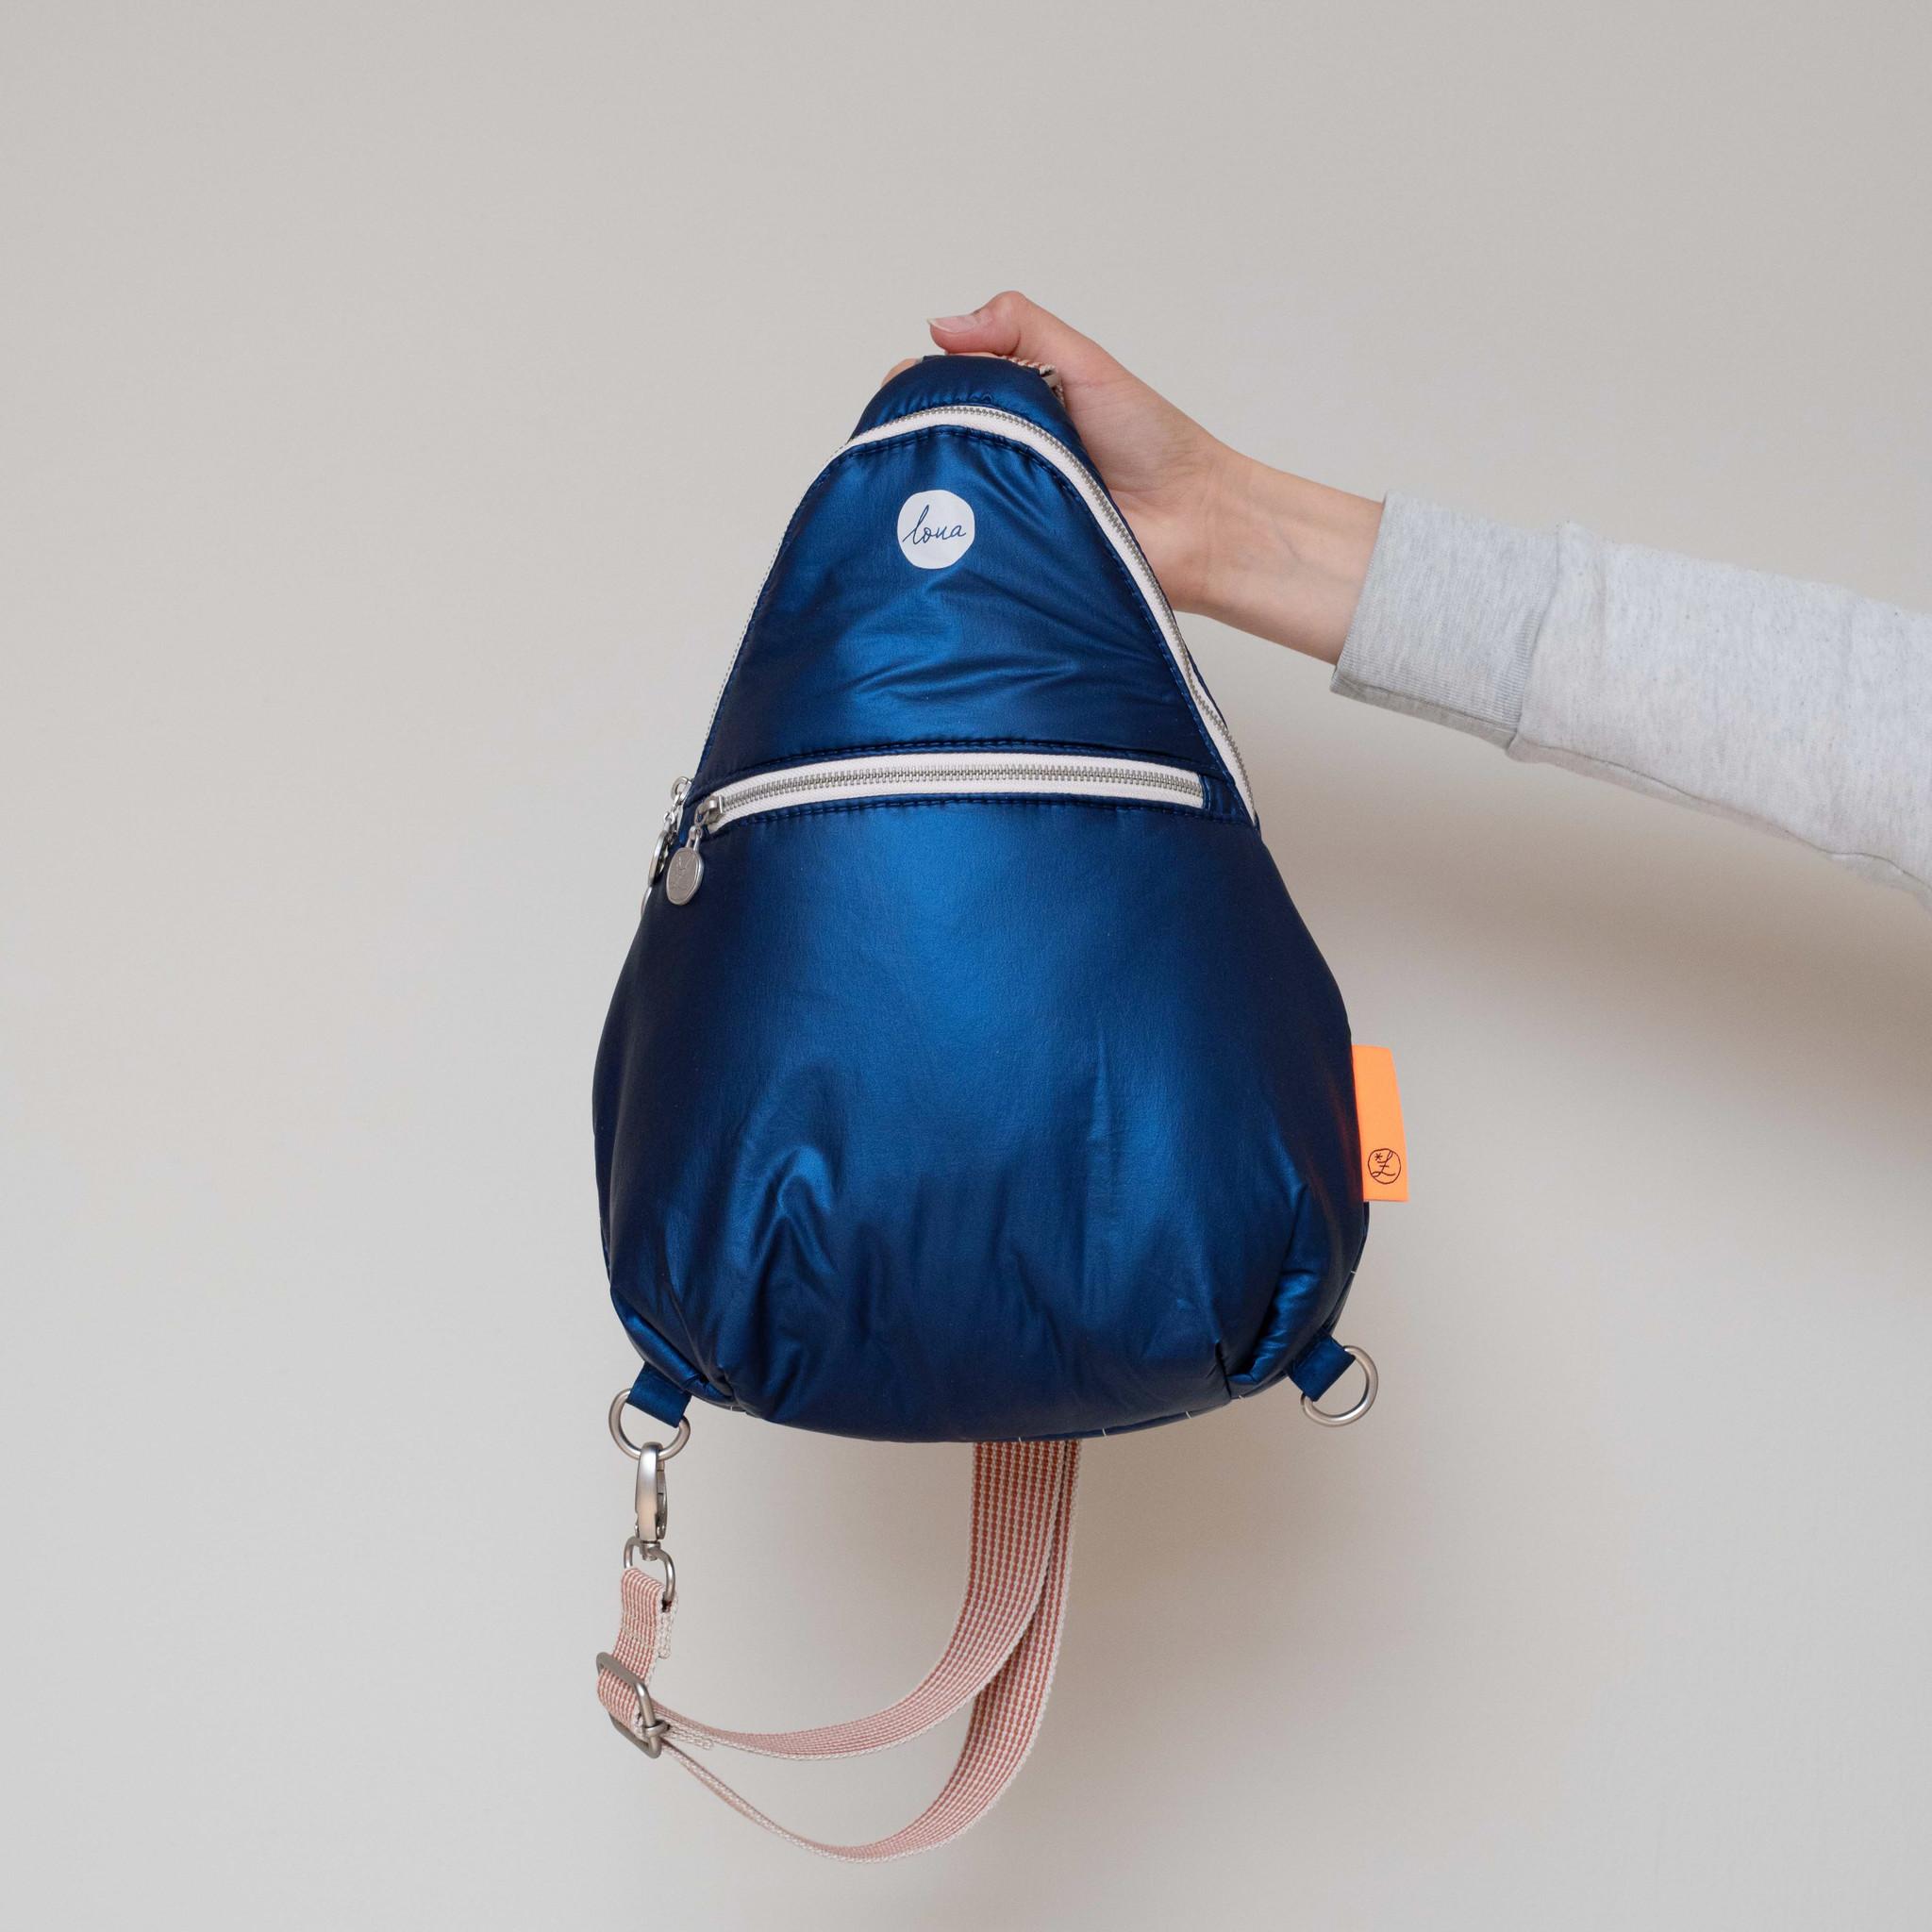 Loua - Drip Bag - Dazling Blue - Tyvek (5 pcs.)-1